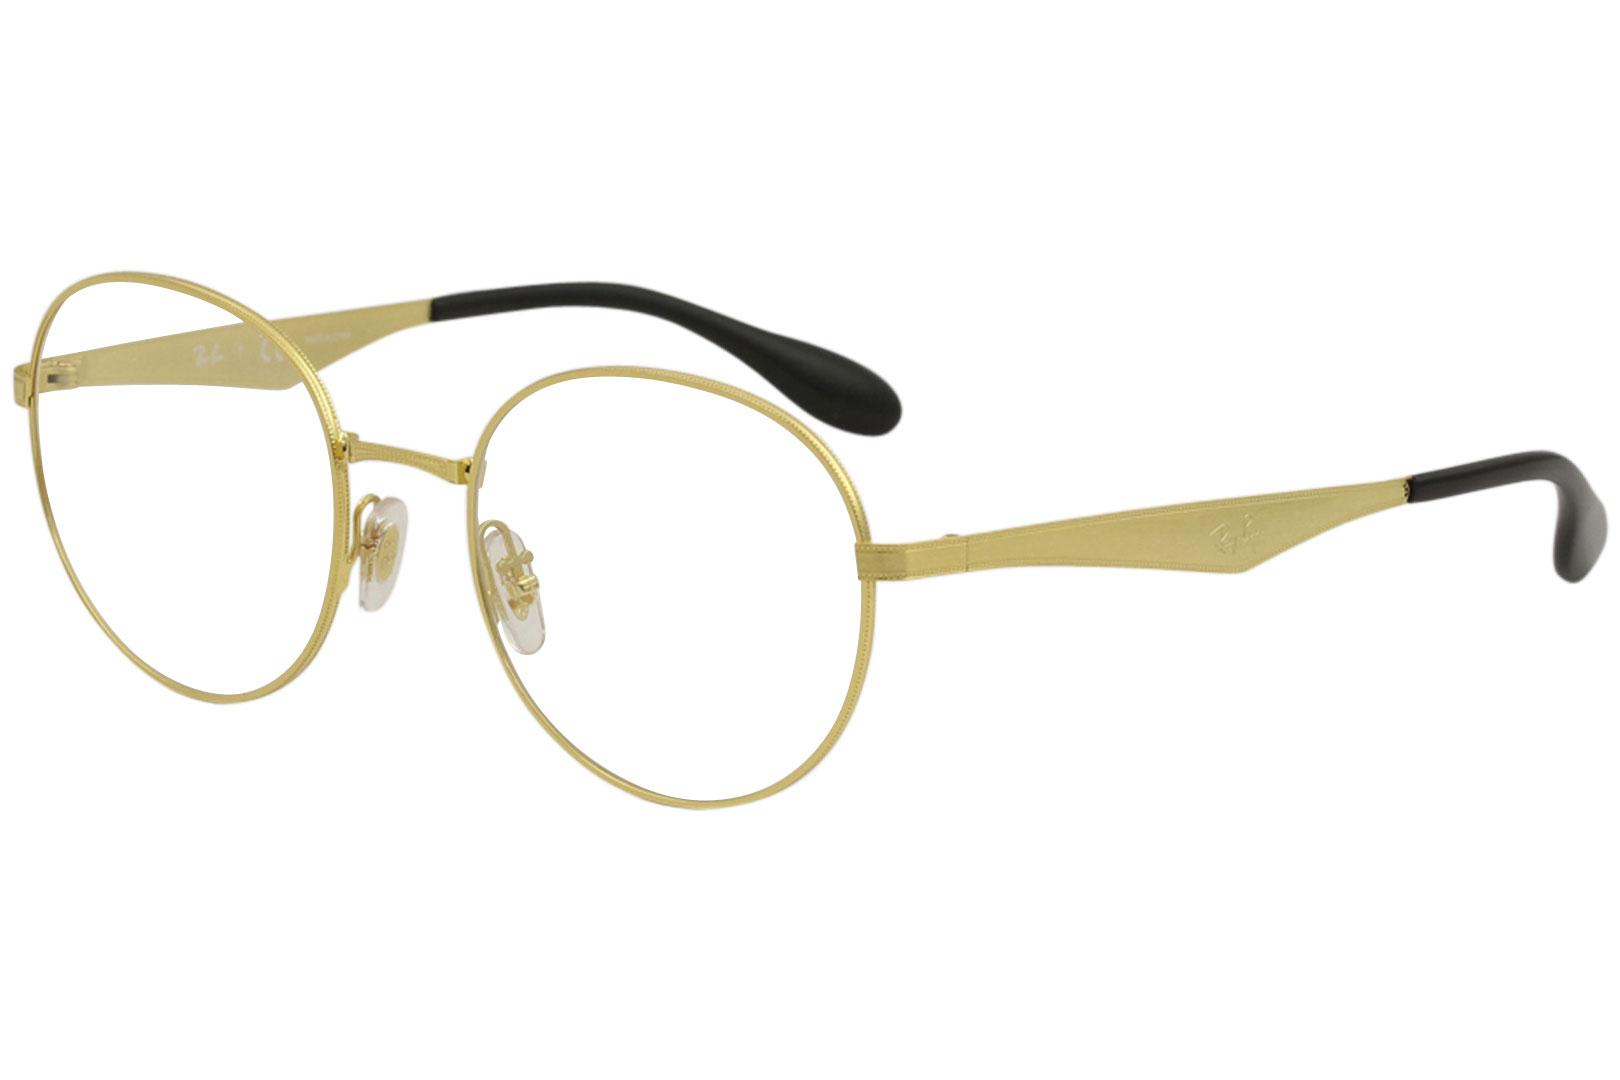 e986ec1f06ae Ray Ban Eyeglasses RX6343 RX 6343 2860 Gold Full Rim RayBan Optical ...